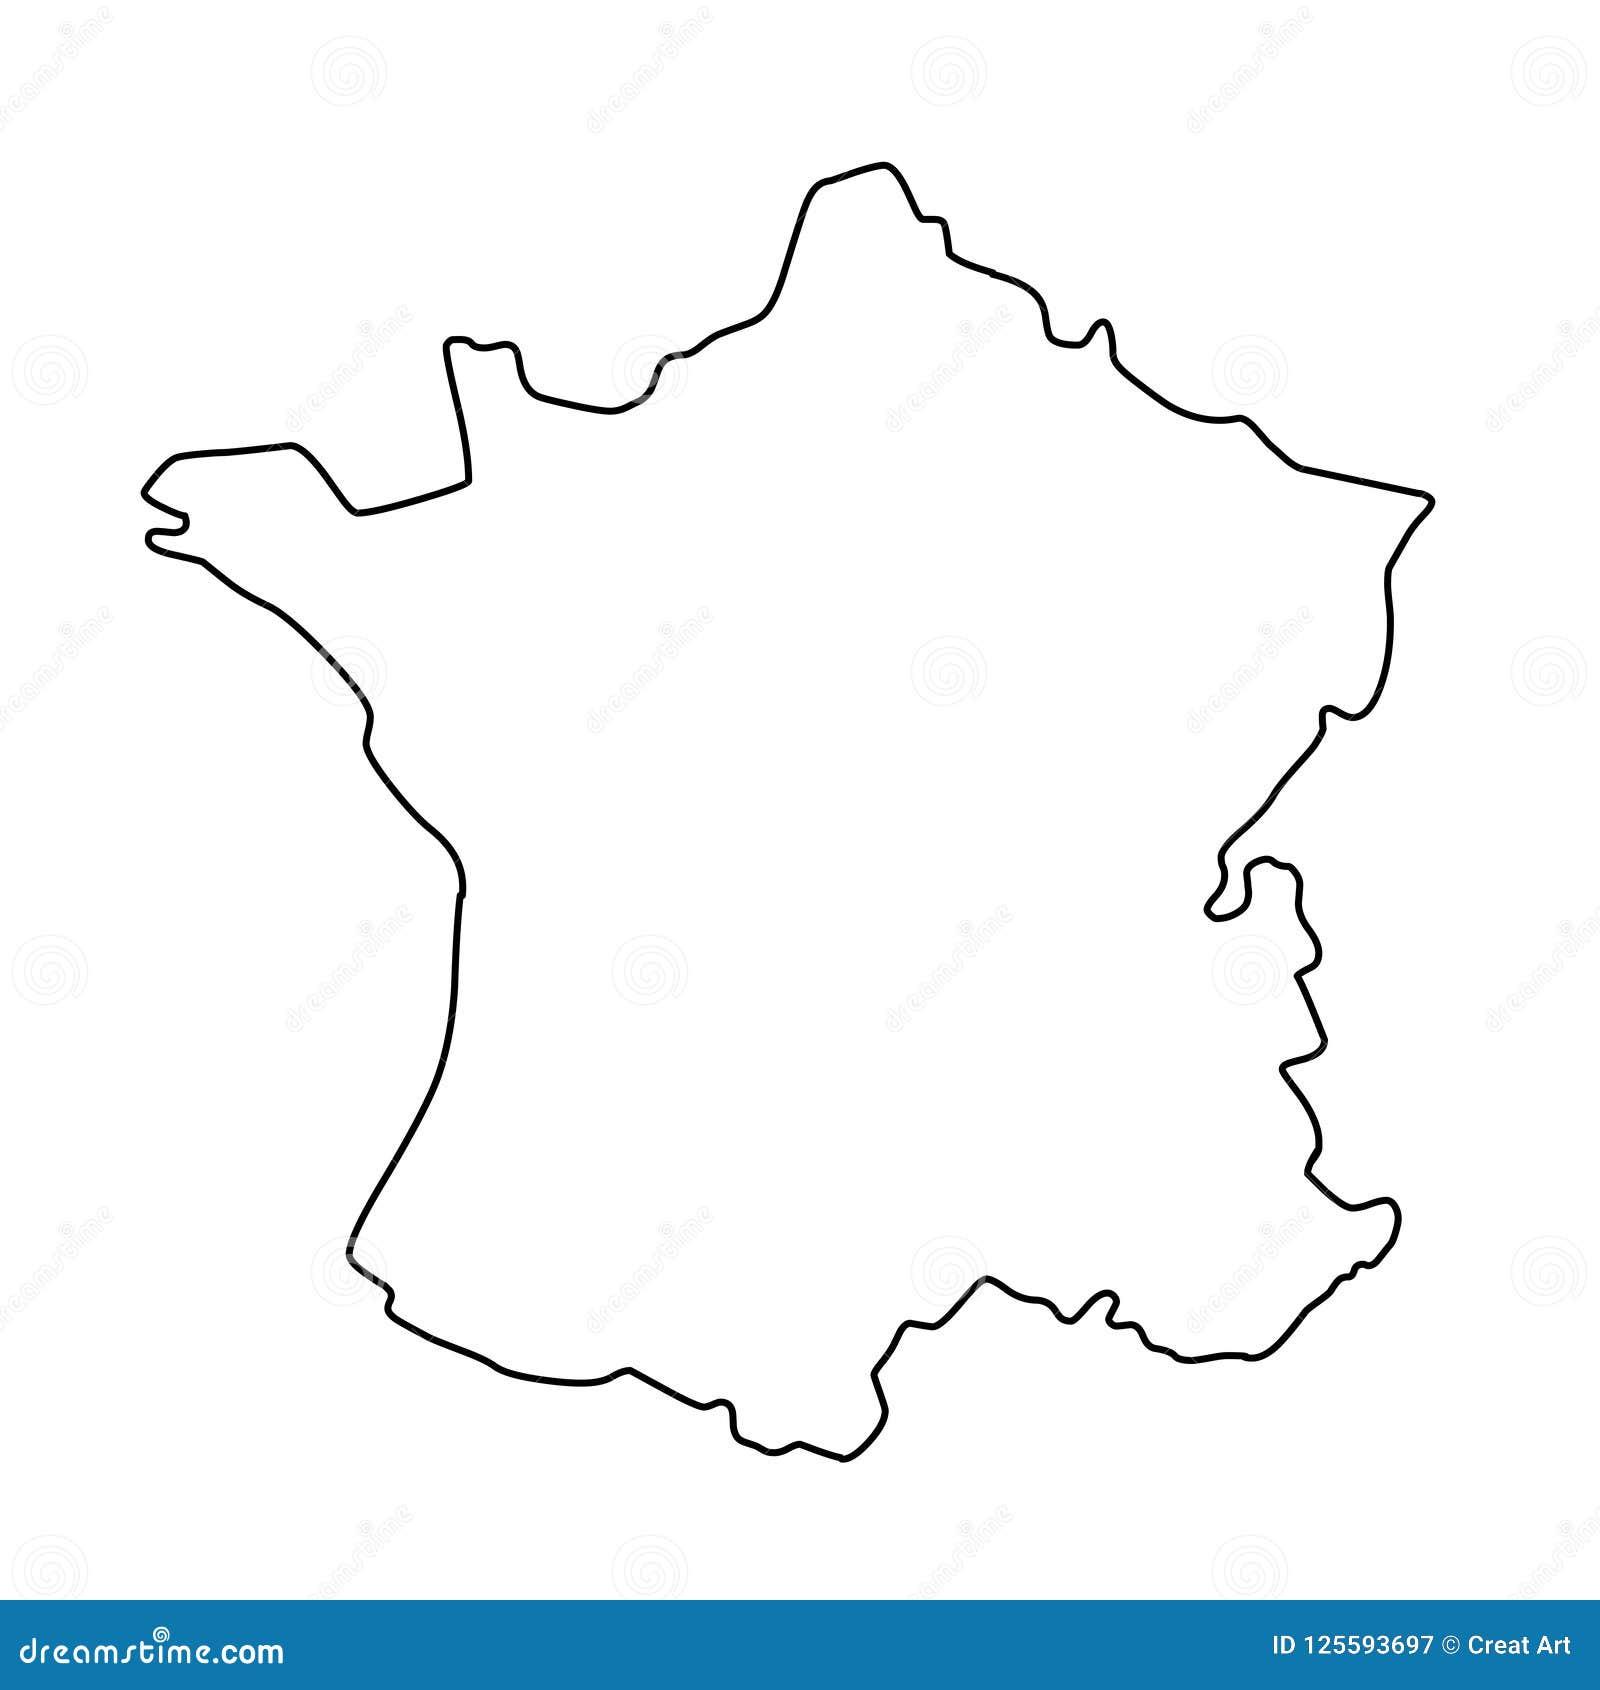 Outline Of Map Of France.France Outline Map Vector Illustration Stock Vector Illustration